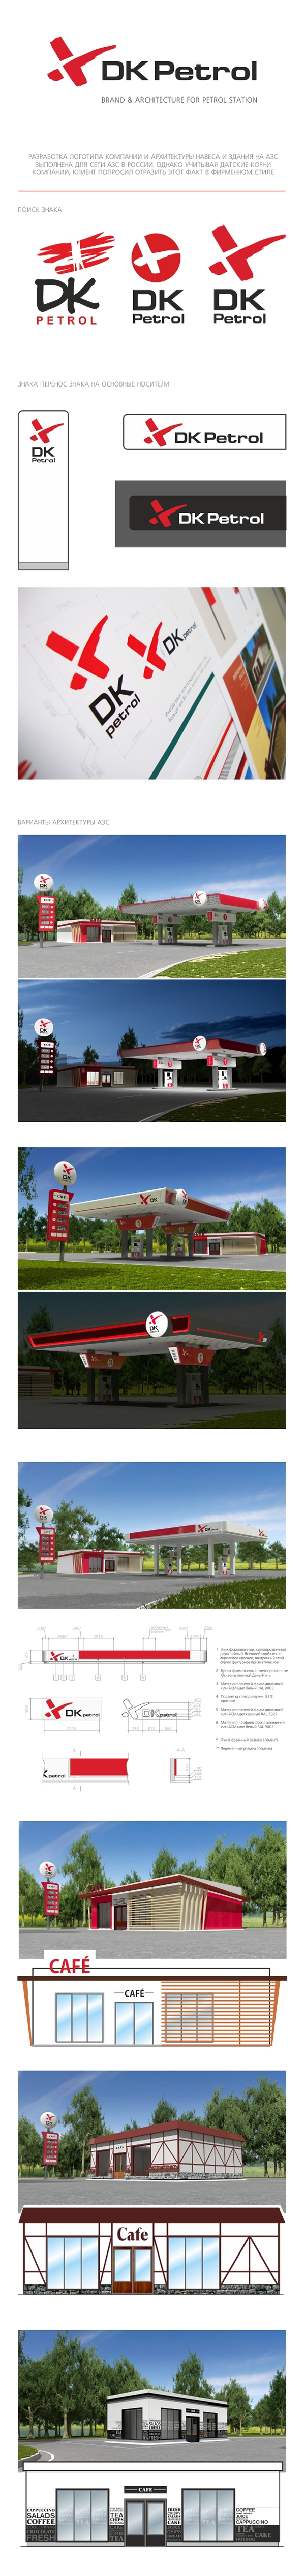 Petrol station branding